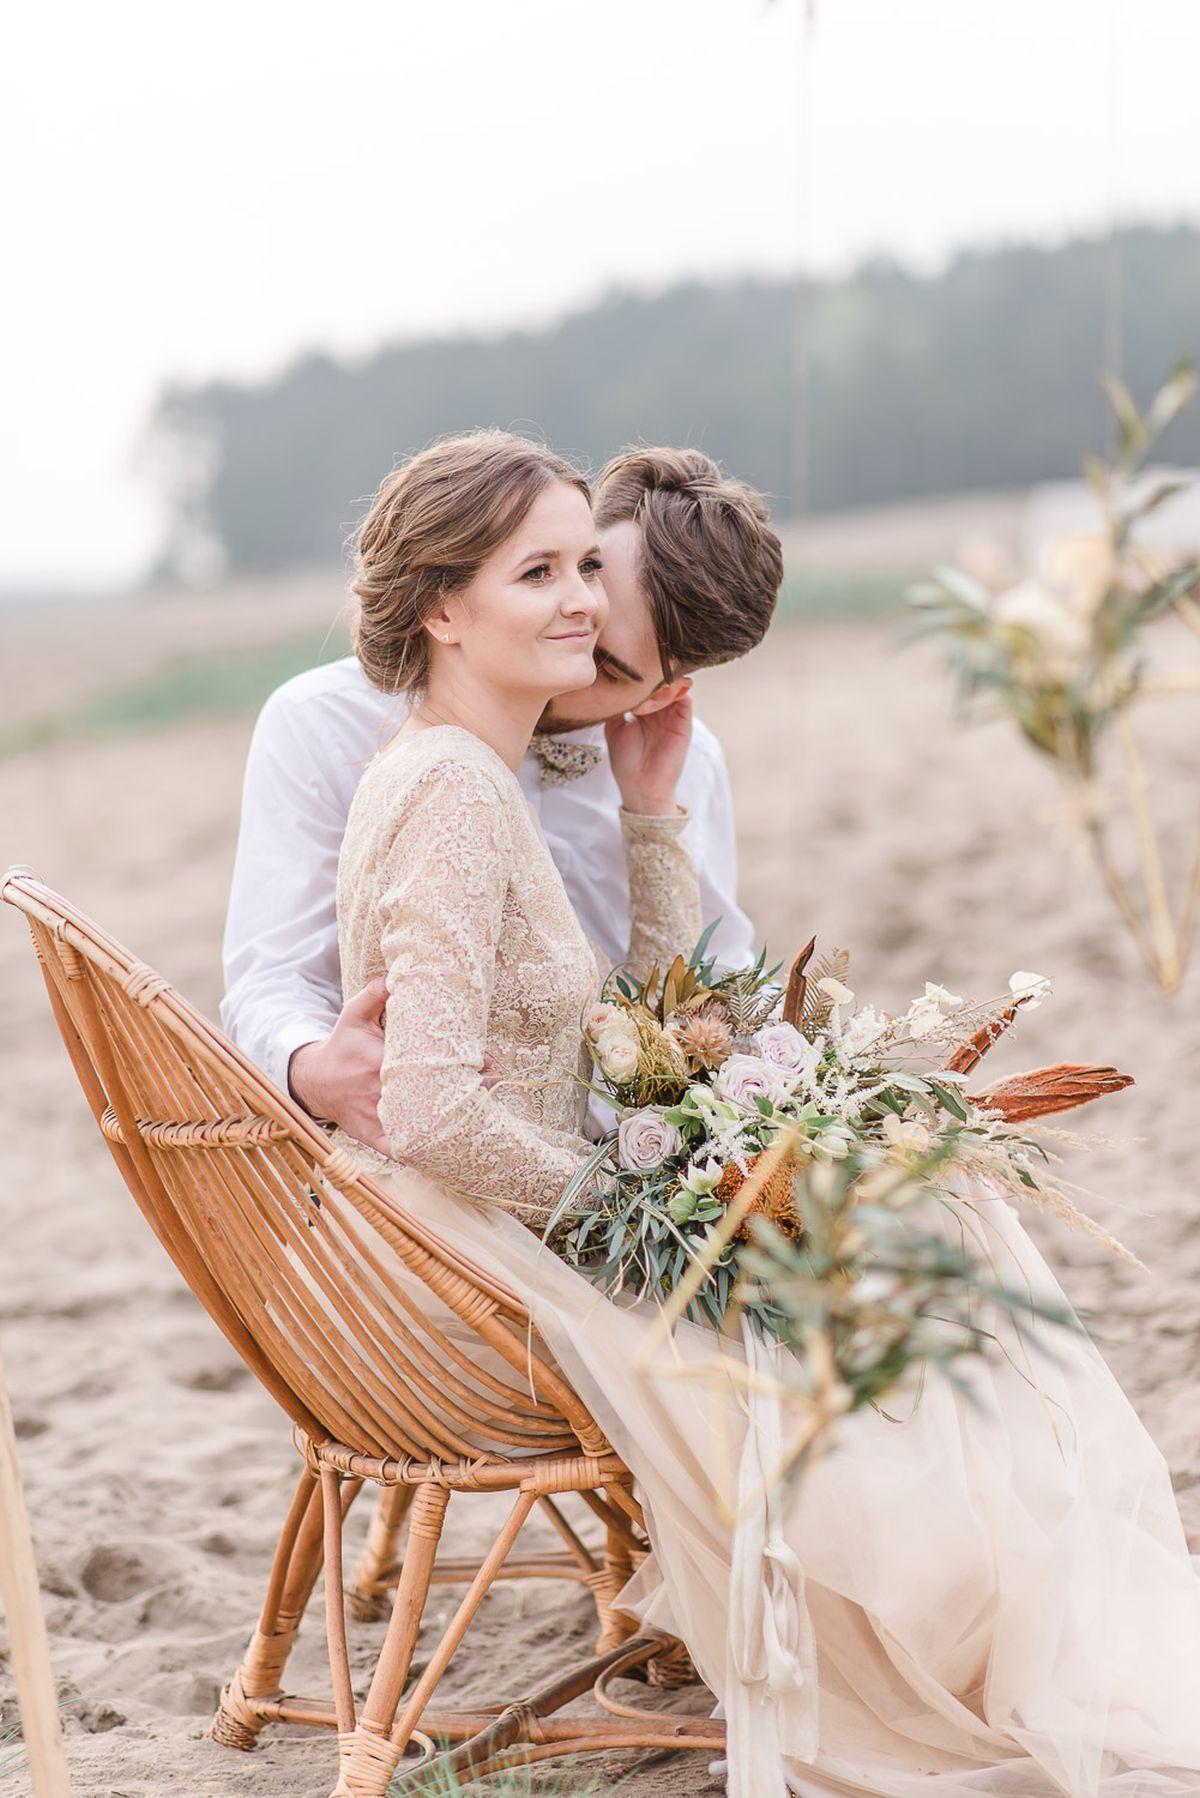 aschaaa-photography-wedding-shoot-wüste (111)